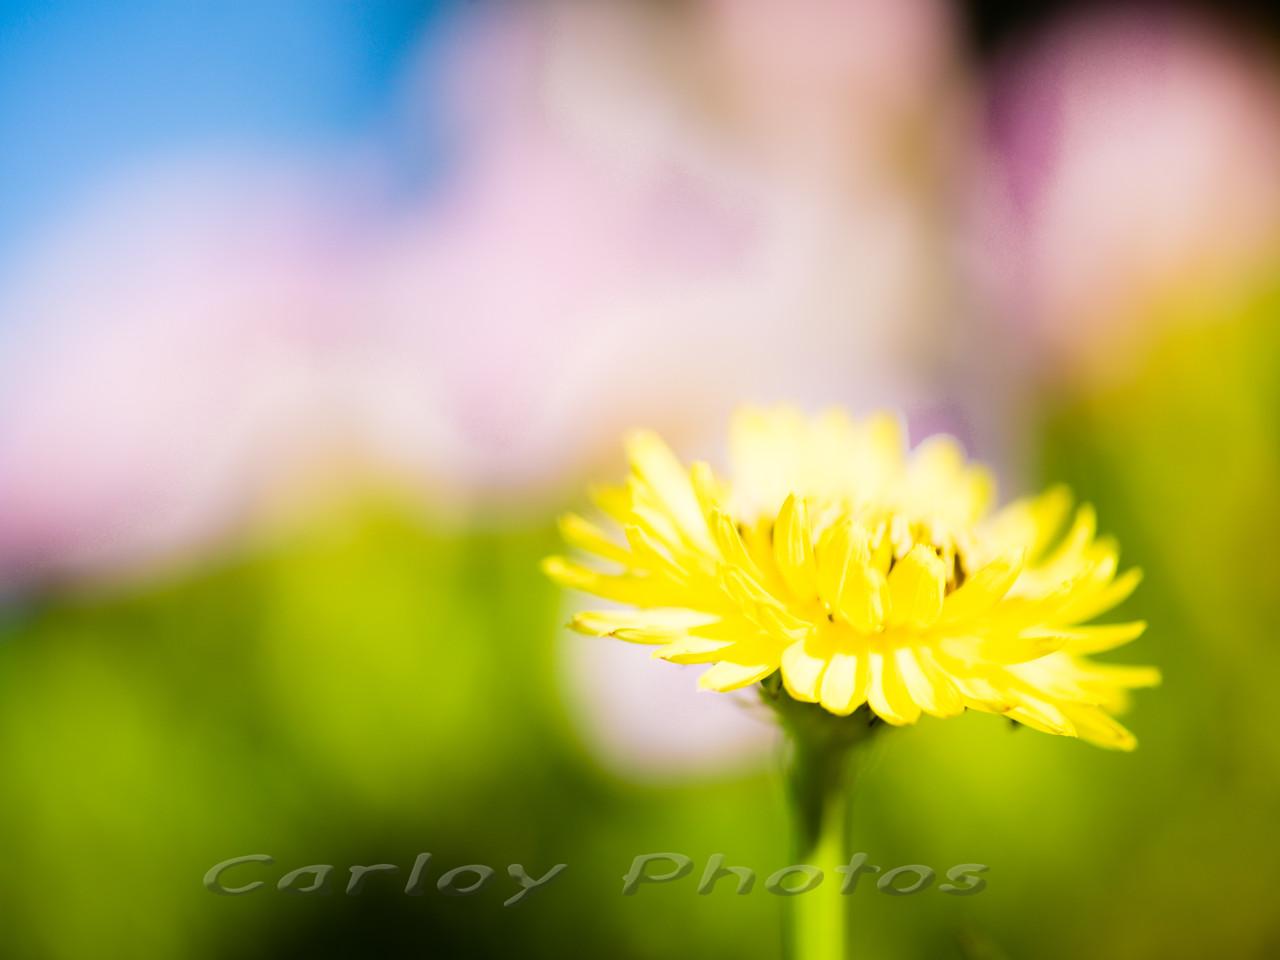 Dandelion Flower amidst the Primroses